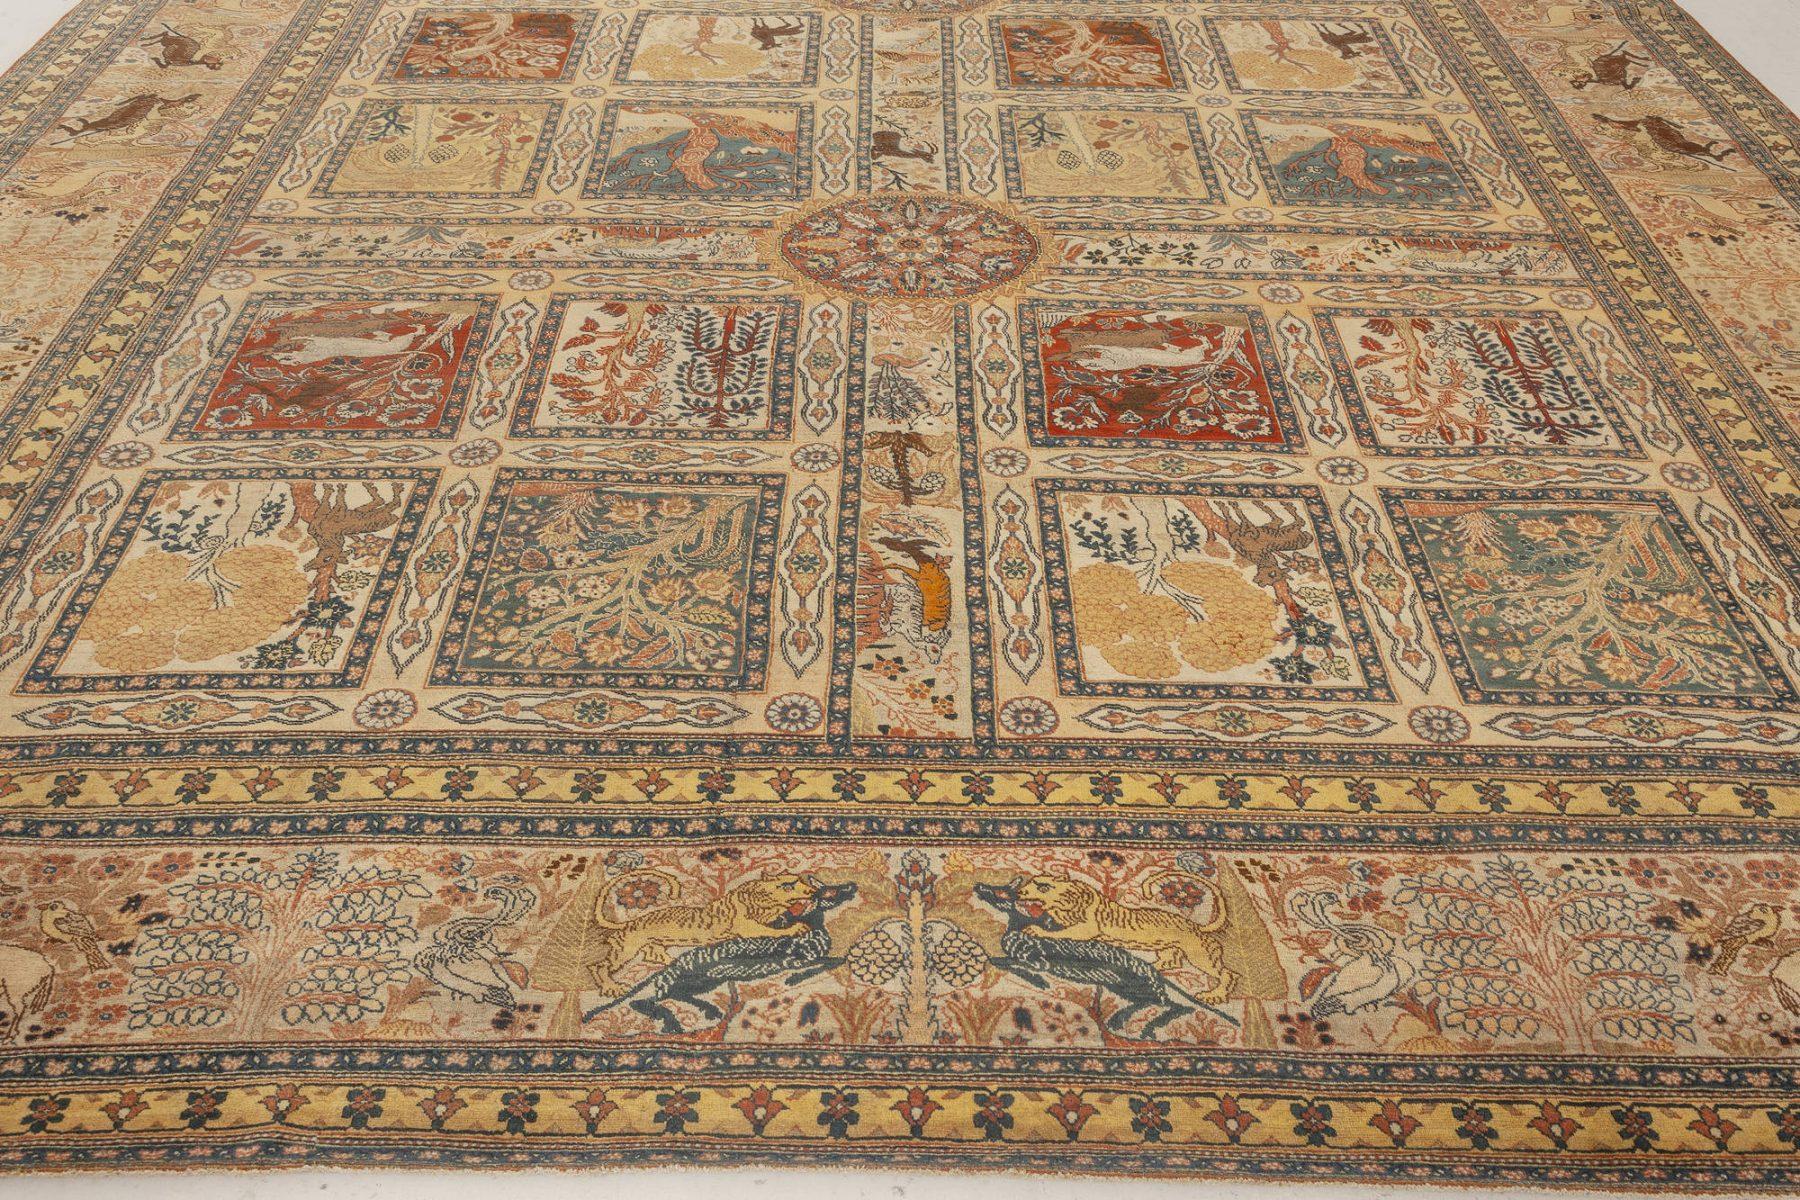 Antique Persian Tabriz Handwoven Wool Rug BB7012